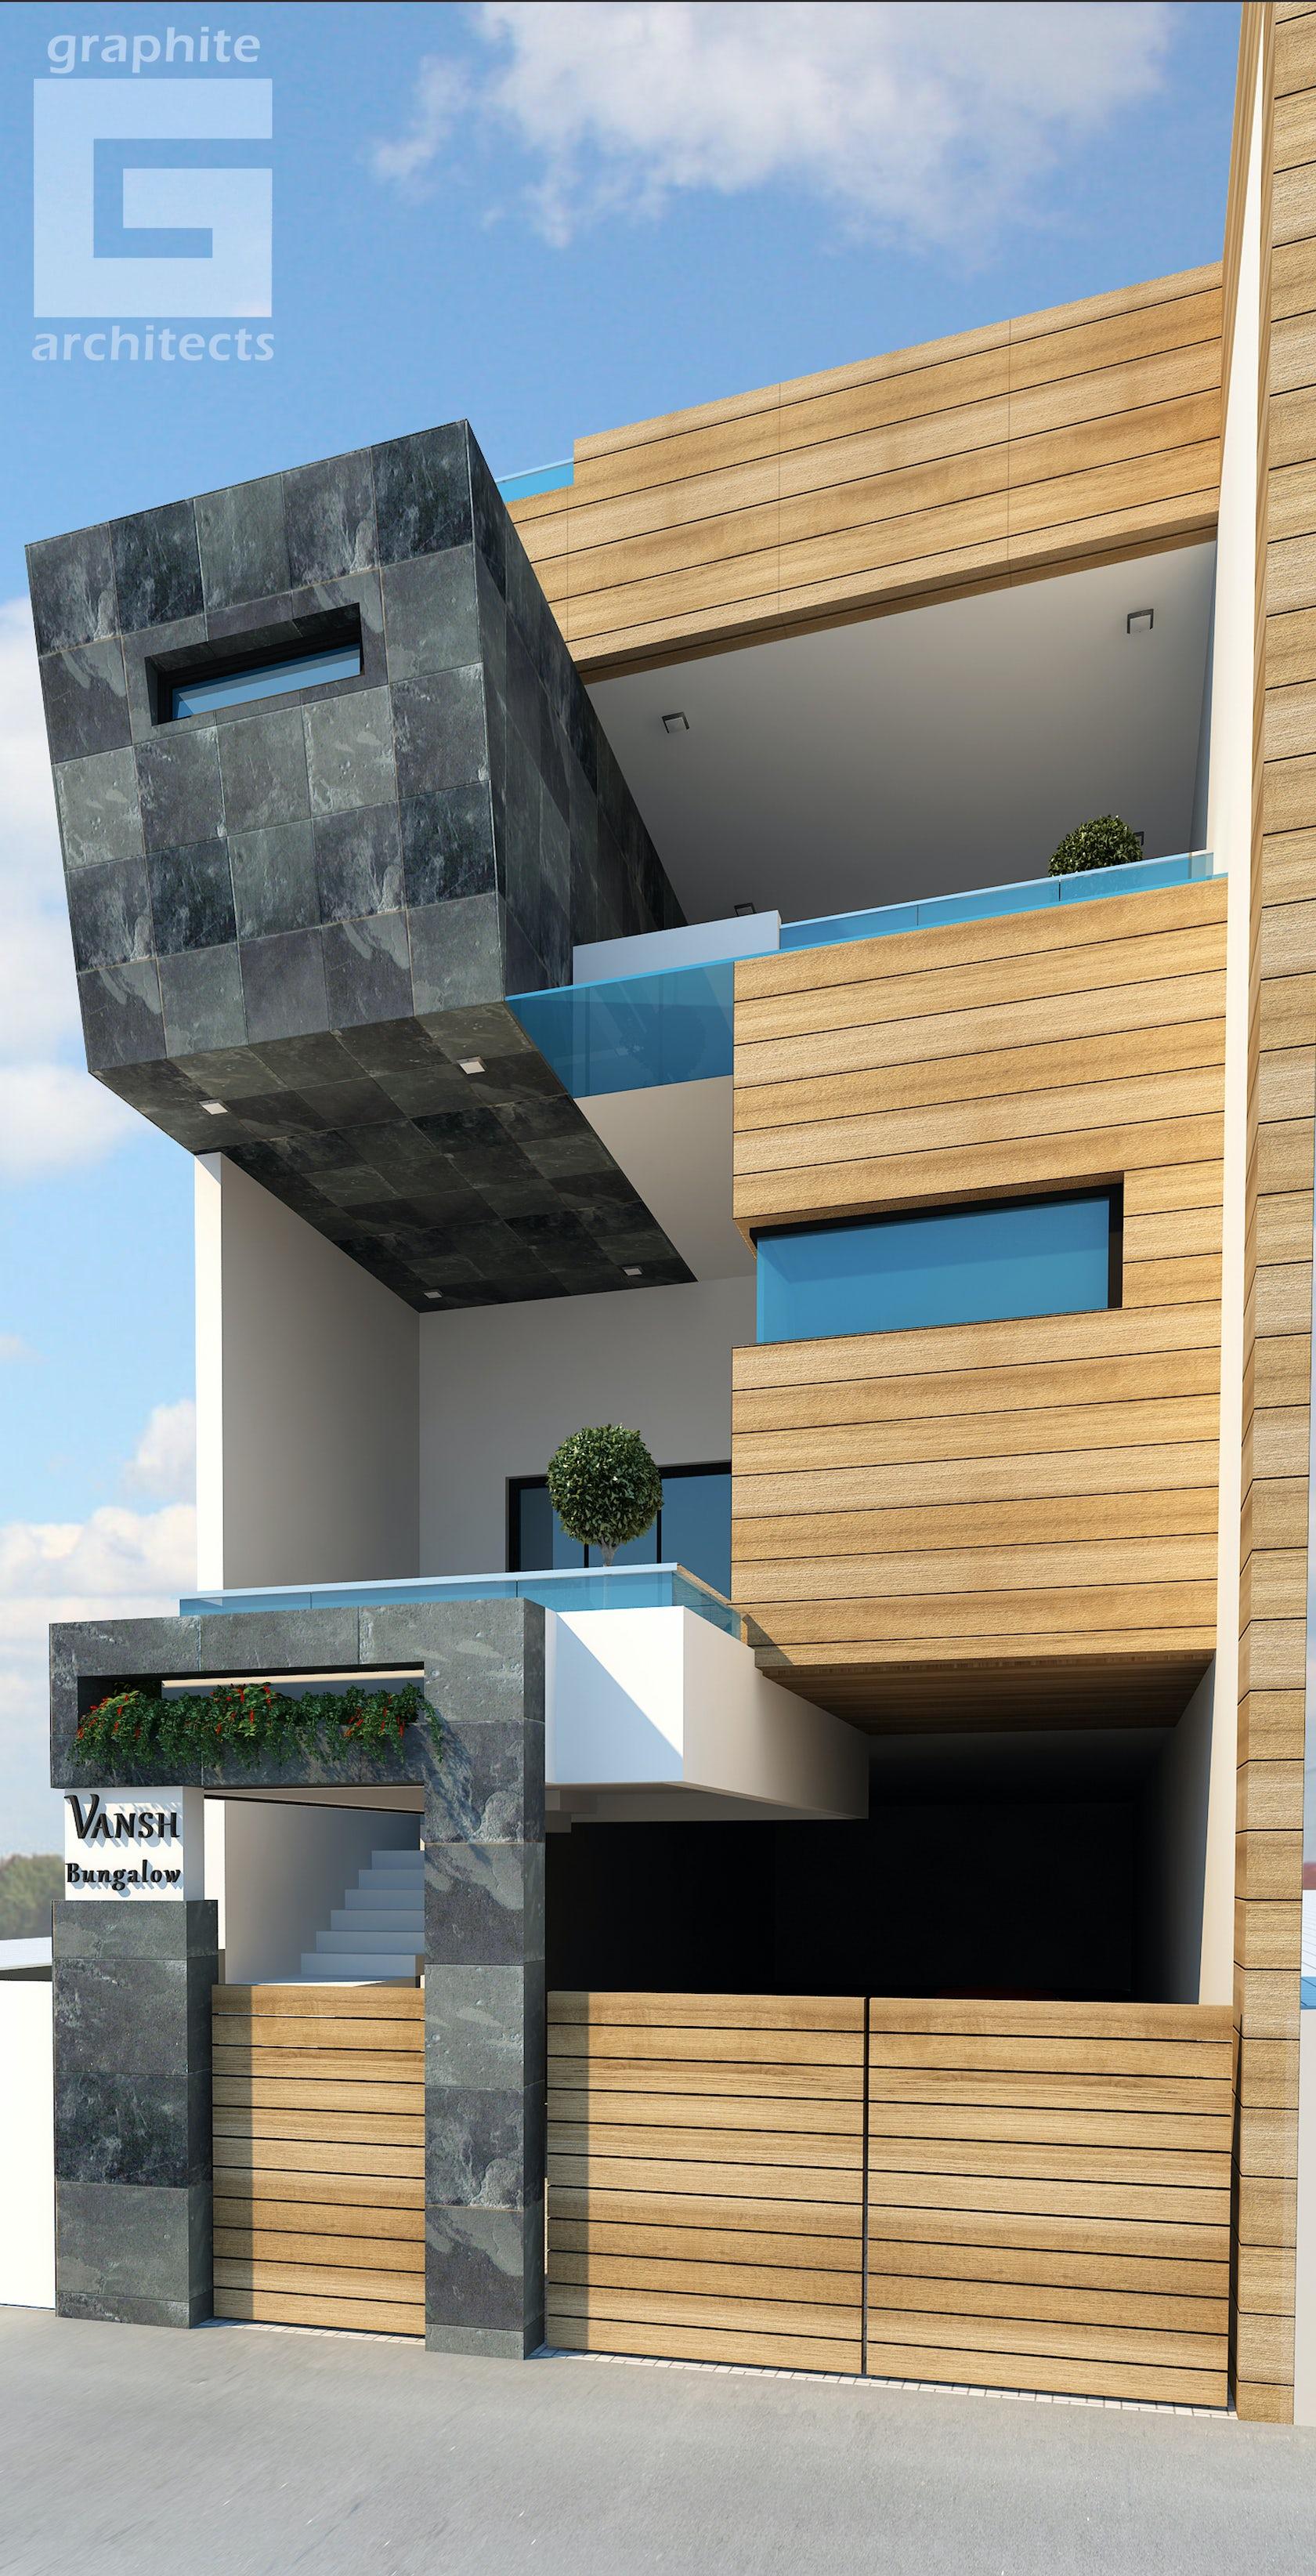 Graphite Architects Interiors On Architizer